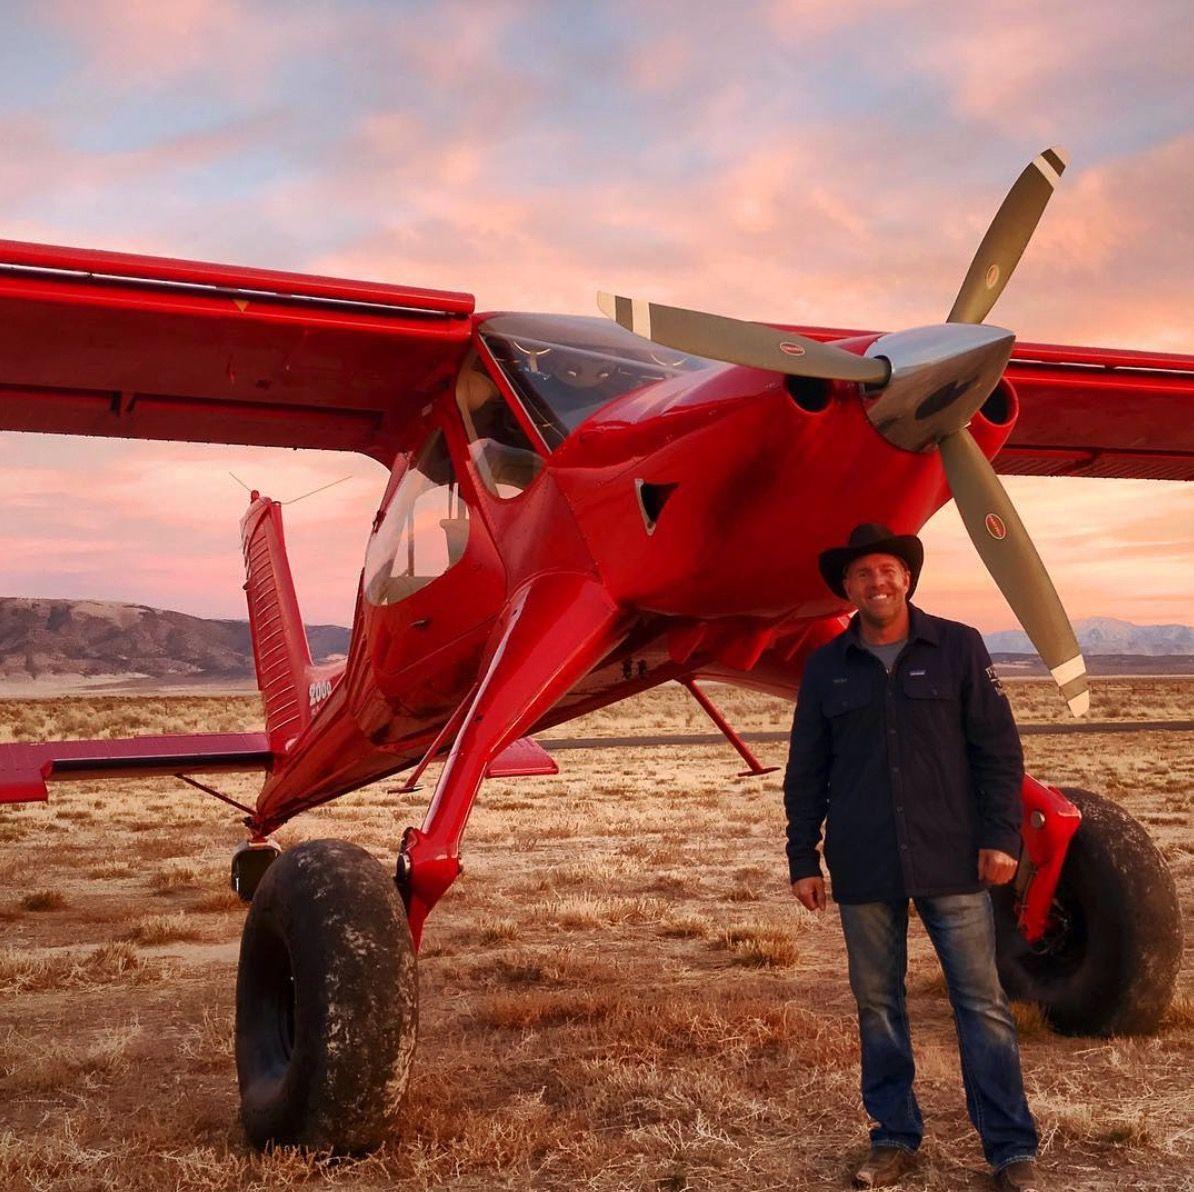 Mike Patey's Draco - The STOL Beast of Oshkosh | Bush plane